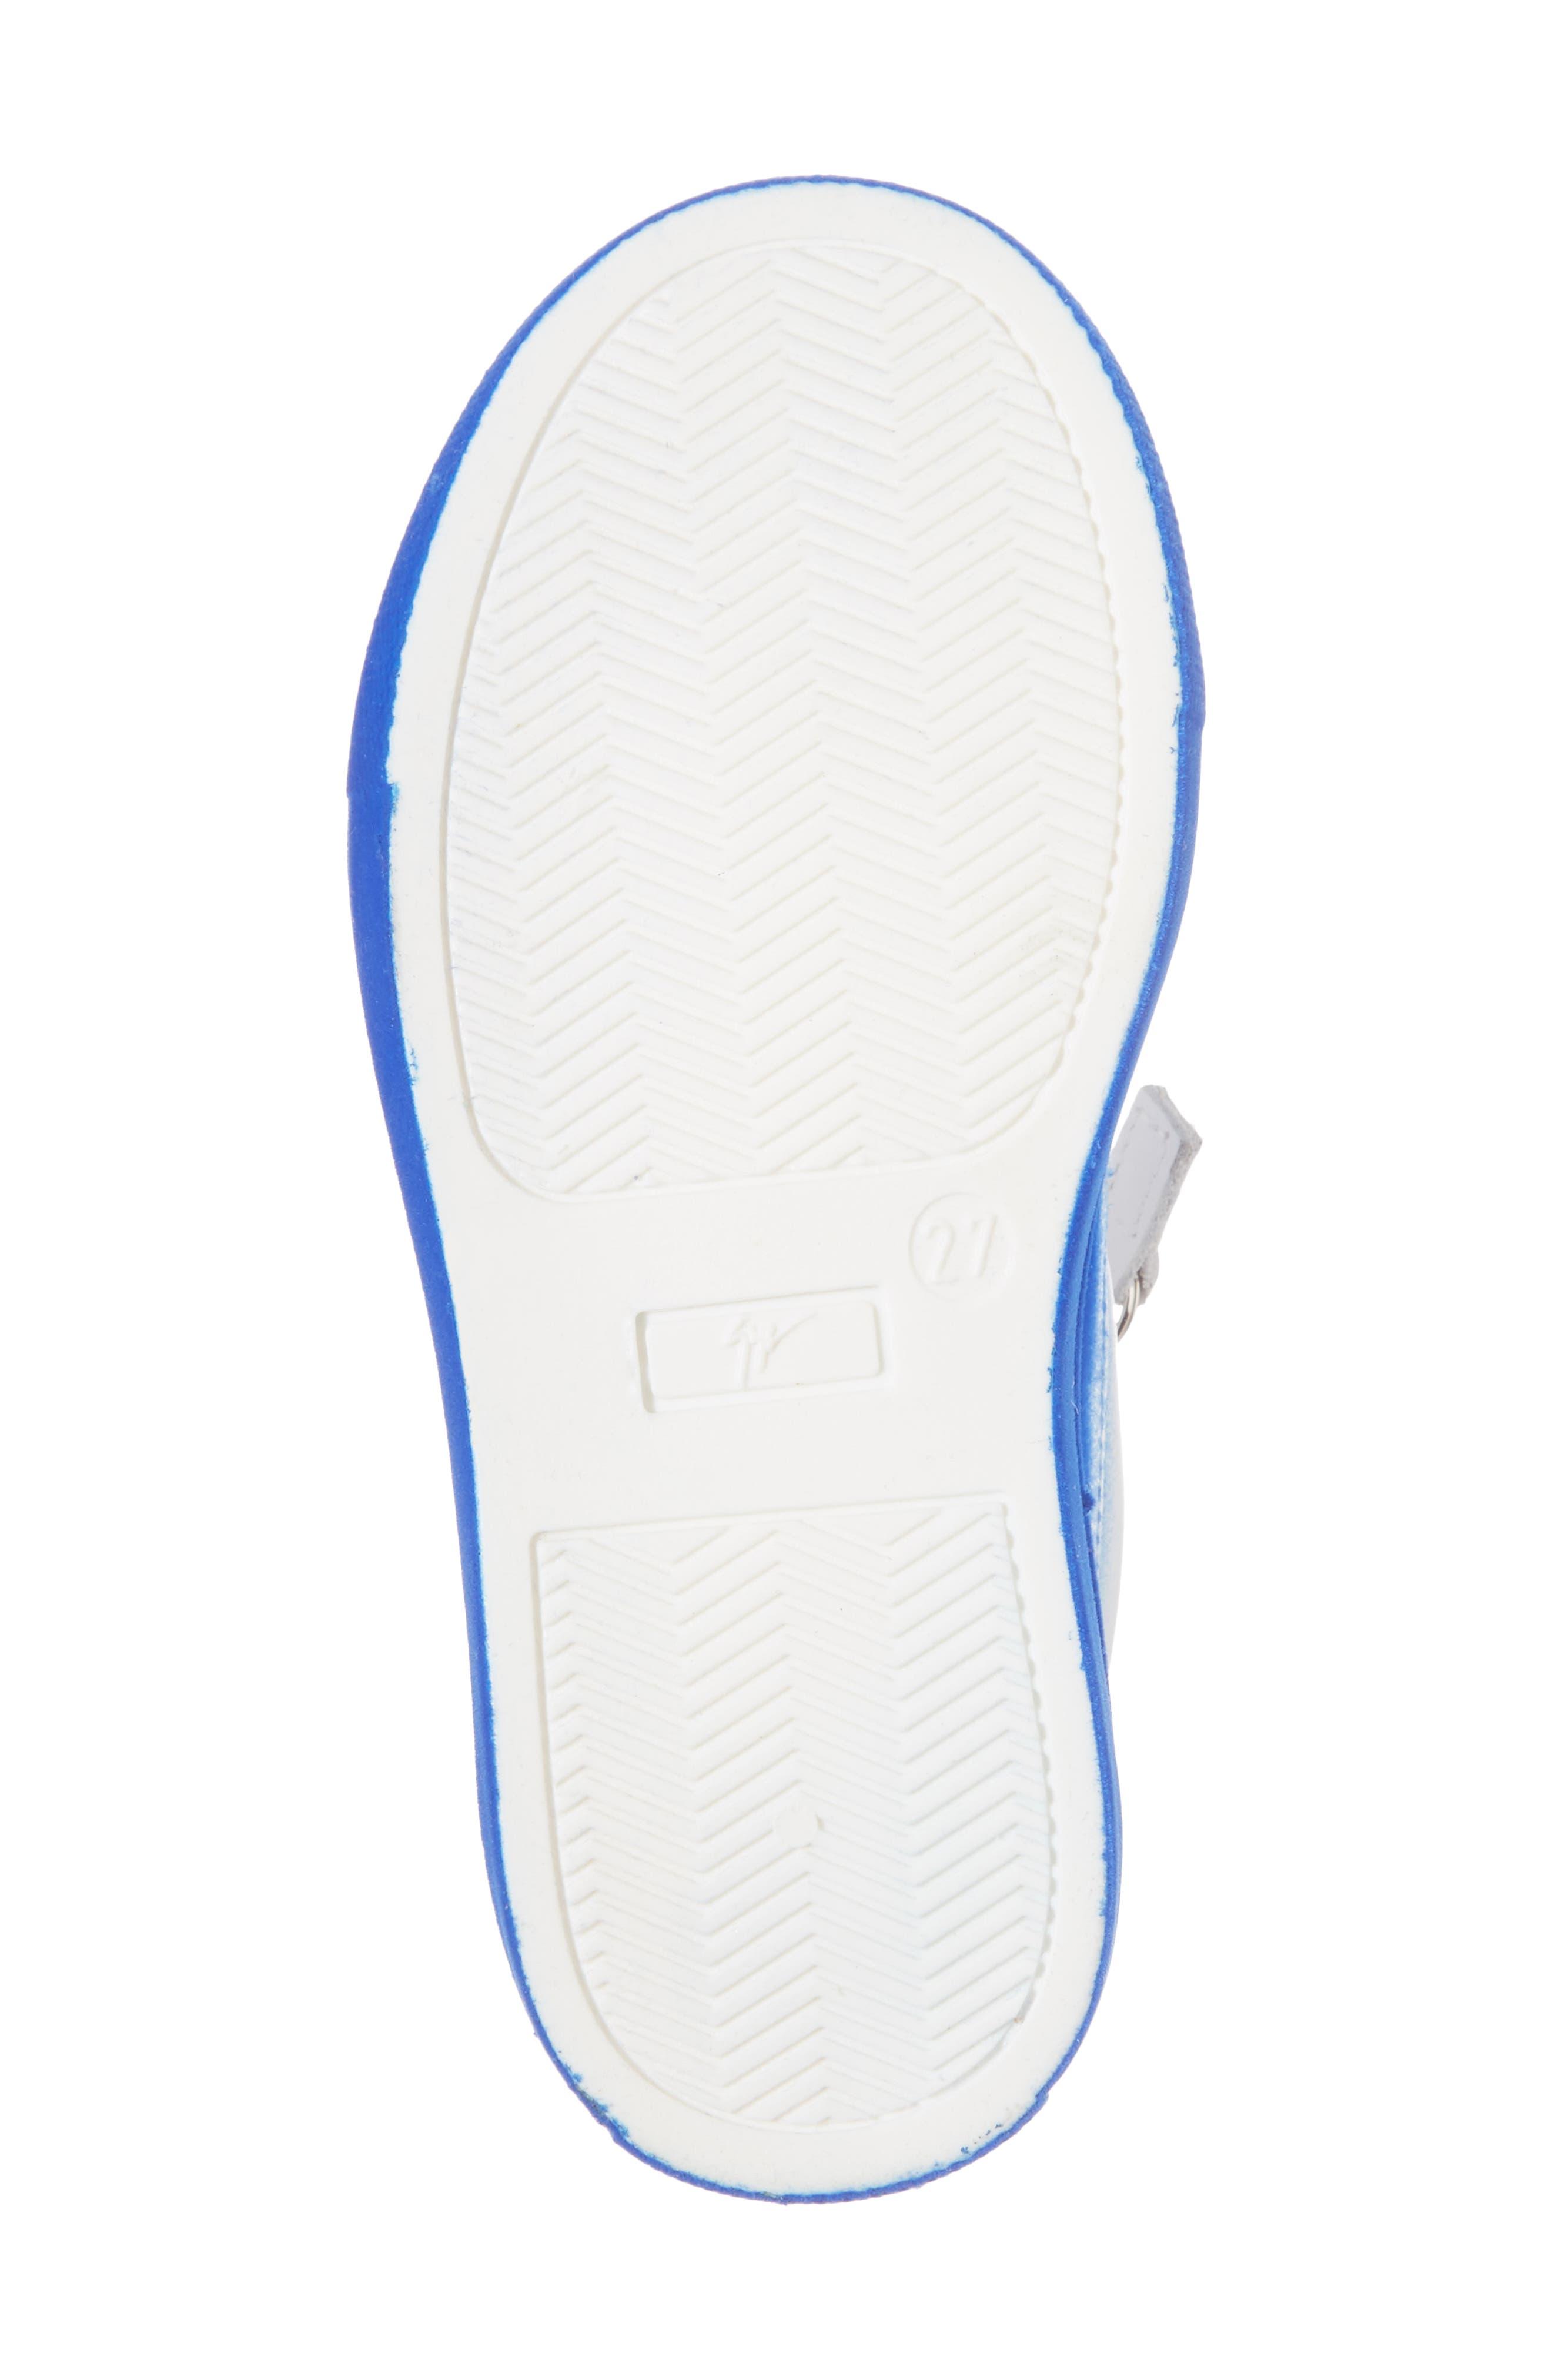 Smuggy Ombré Flocked Sneaker,                             Alternate thumbnail 6, color,                             BLUE/ WHITE